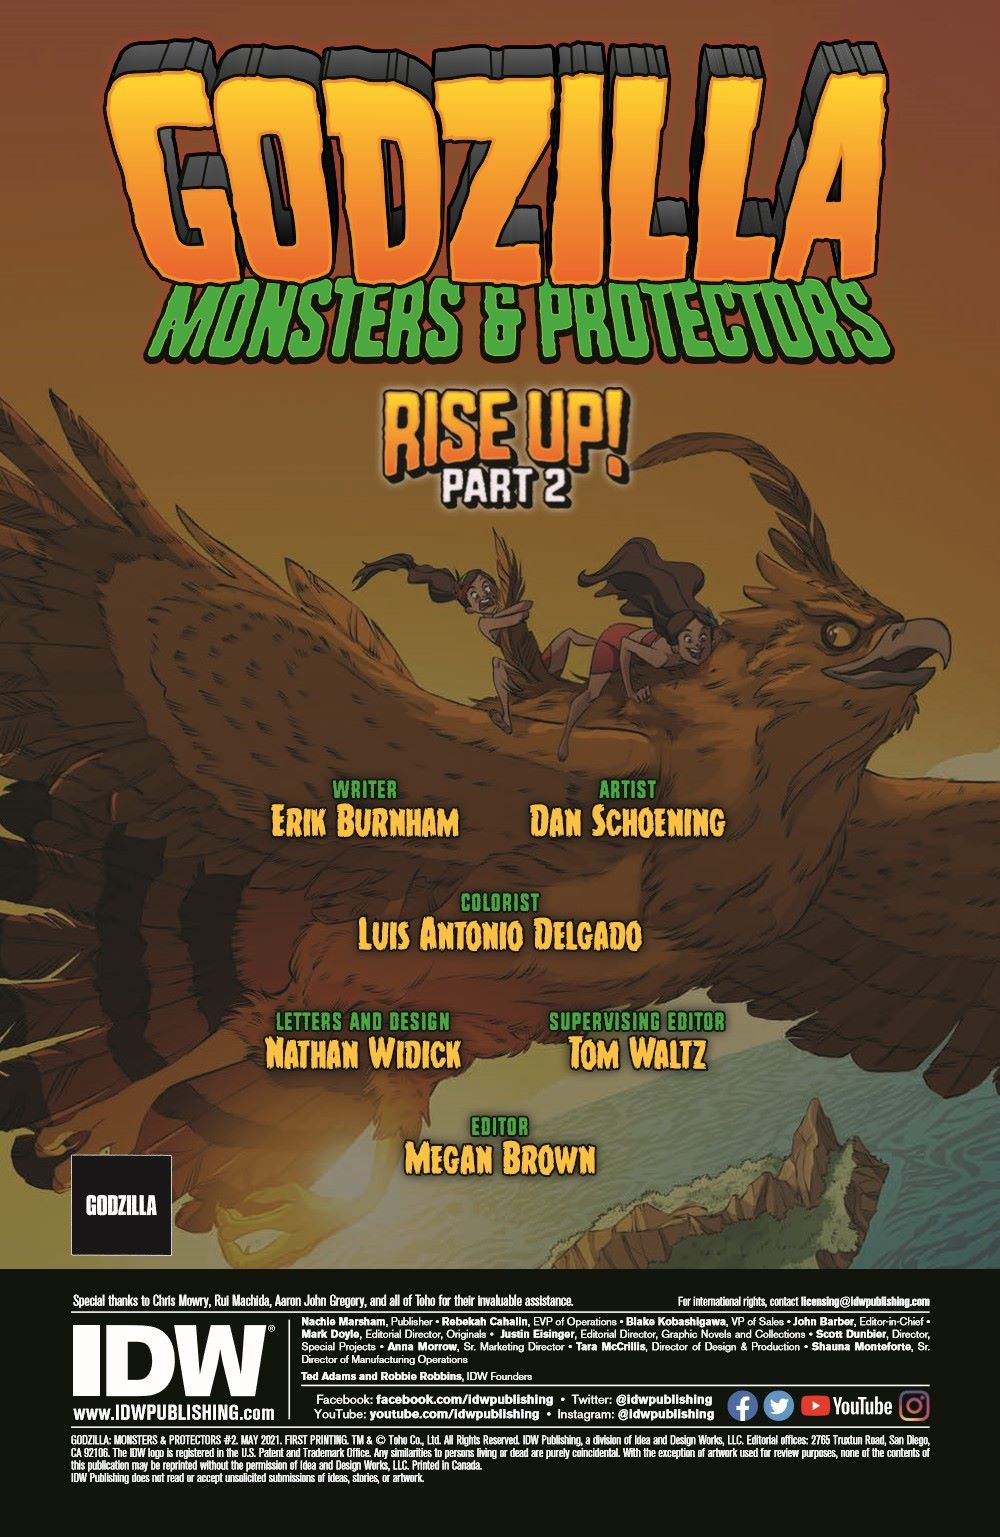 Godzilla_MnP_02_pr-2 ComicList Previews: GODZILLA MONSTERS AND PROTECTORS #2 (OF 5)